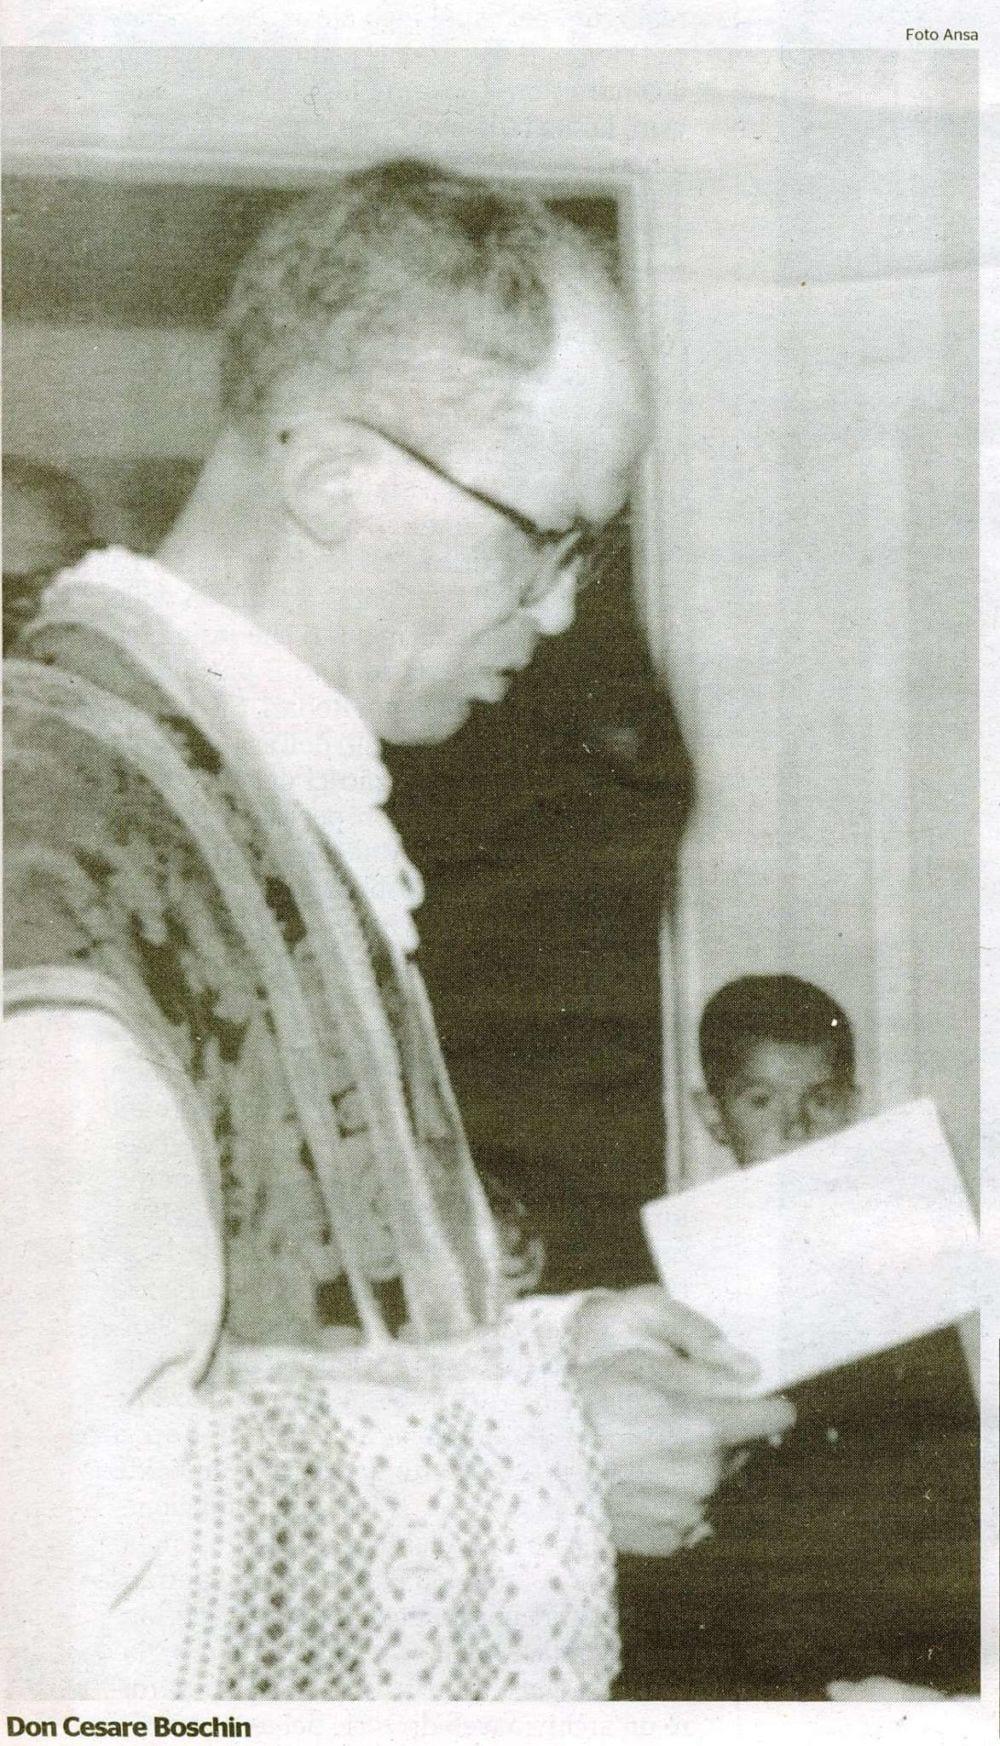 Don Cesare Boschin